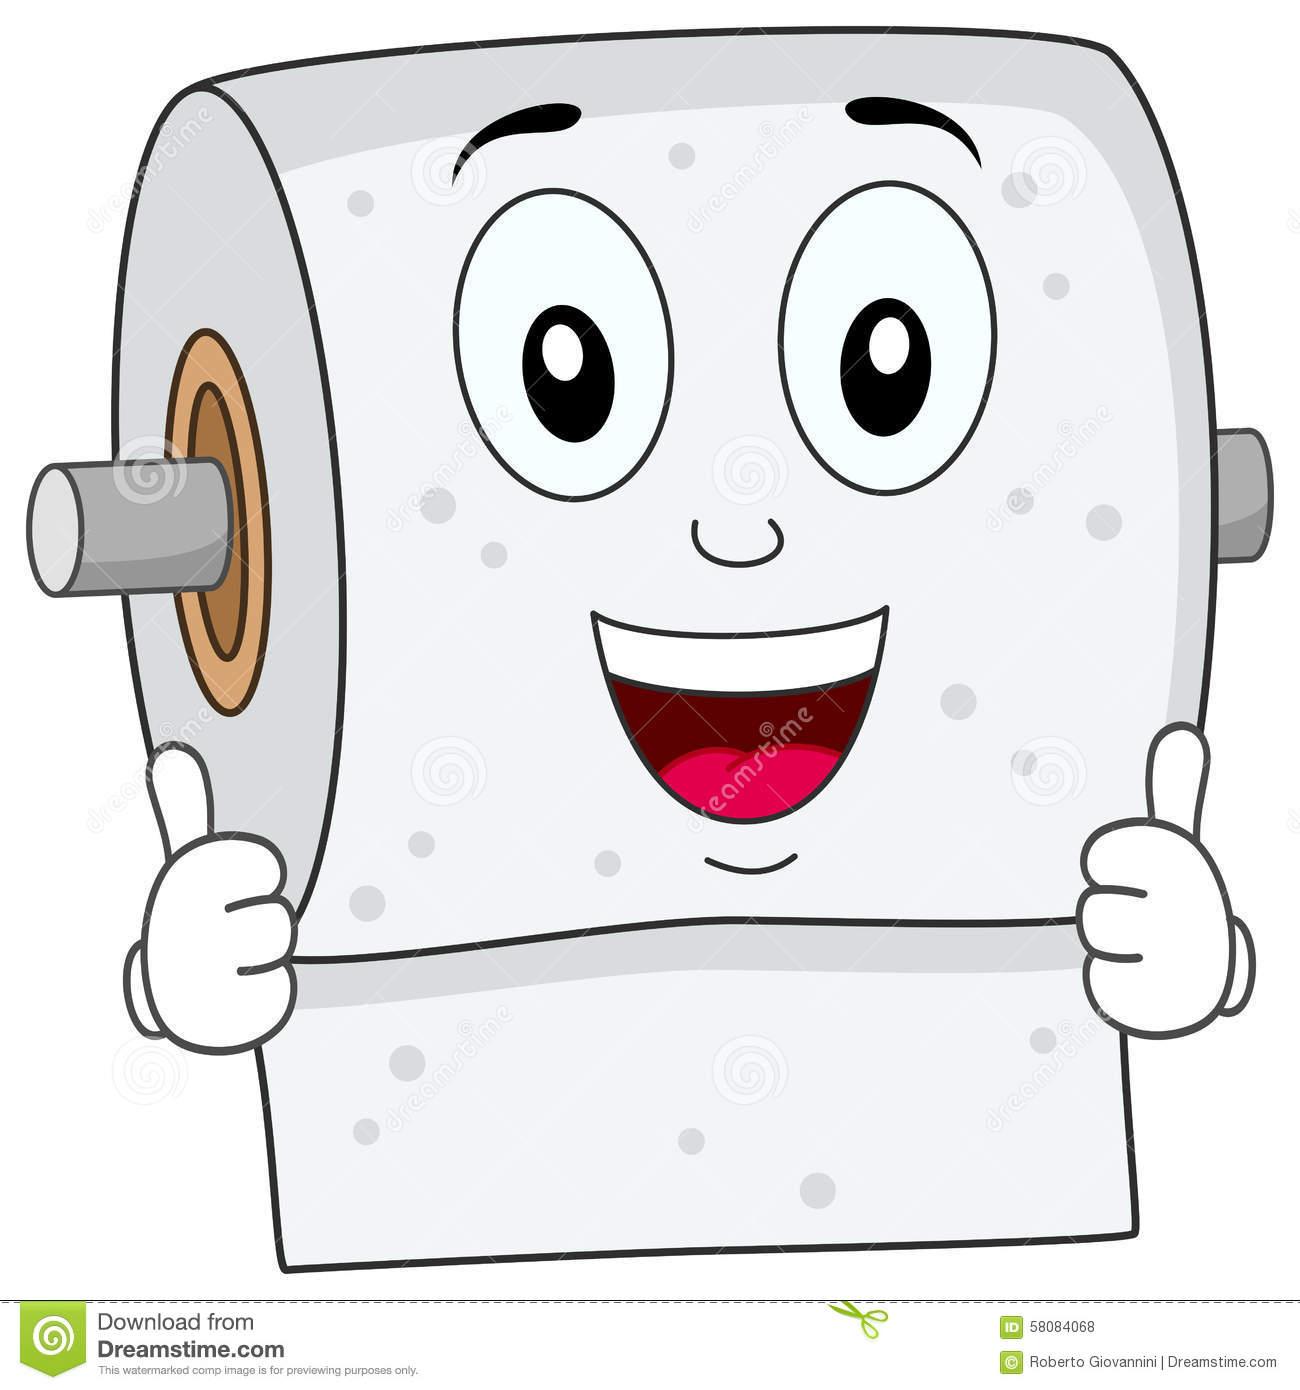 Free Restroom Cliparts Download Free Clip Art Free Clip: Toilet Paper Clipart 20 Free Cliparts